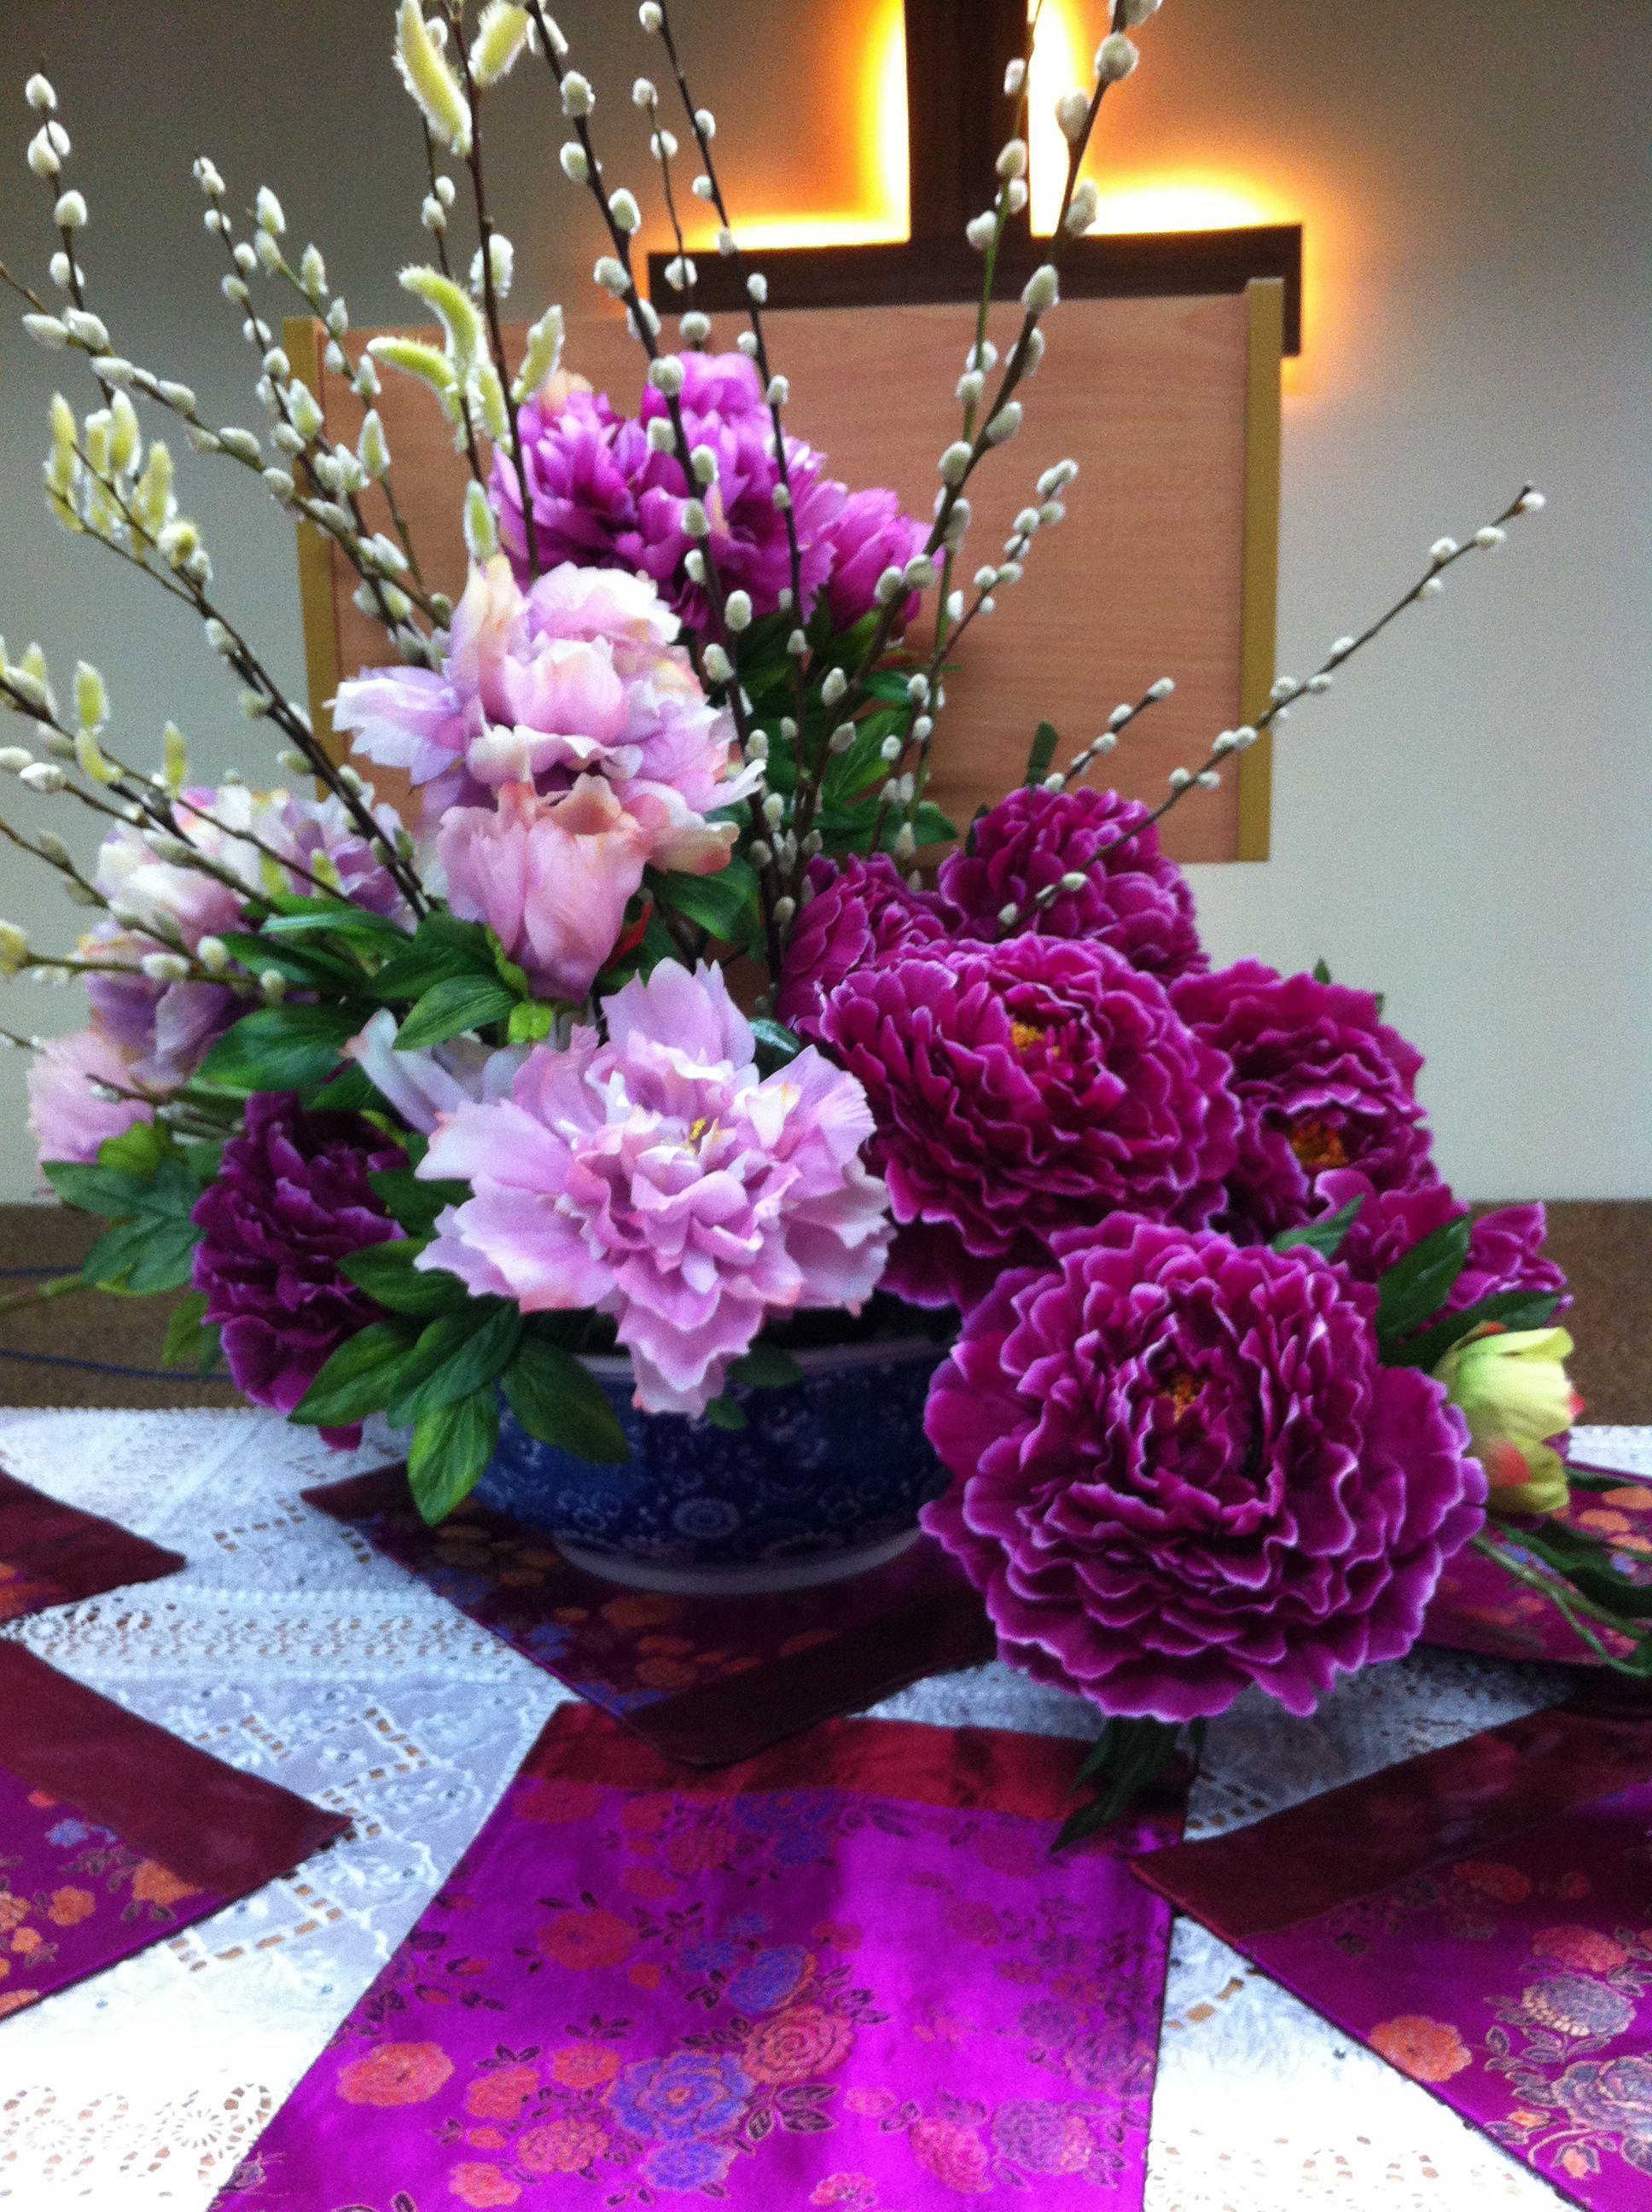 Chinese New Year arrangement Bakman Floral Design is a